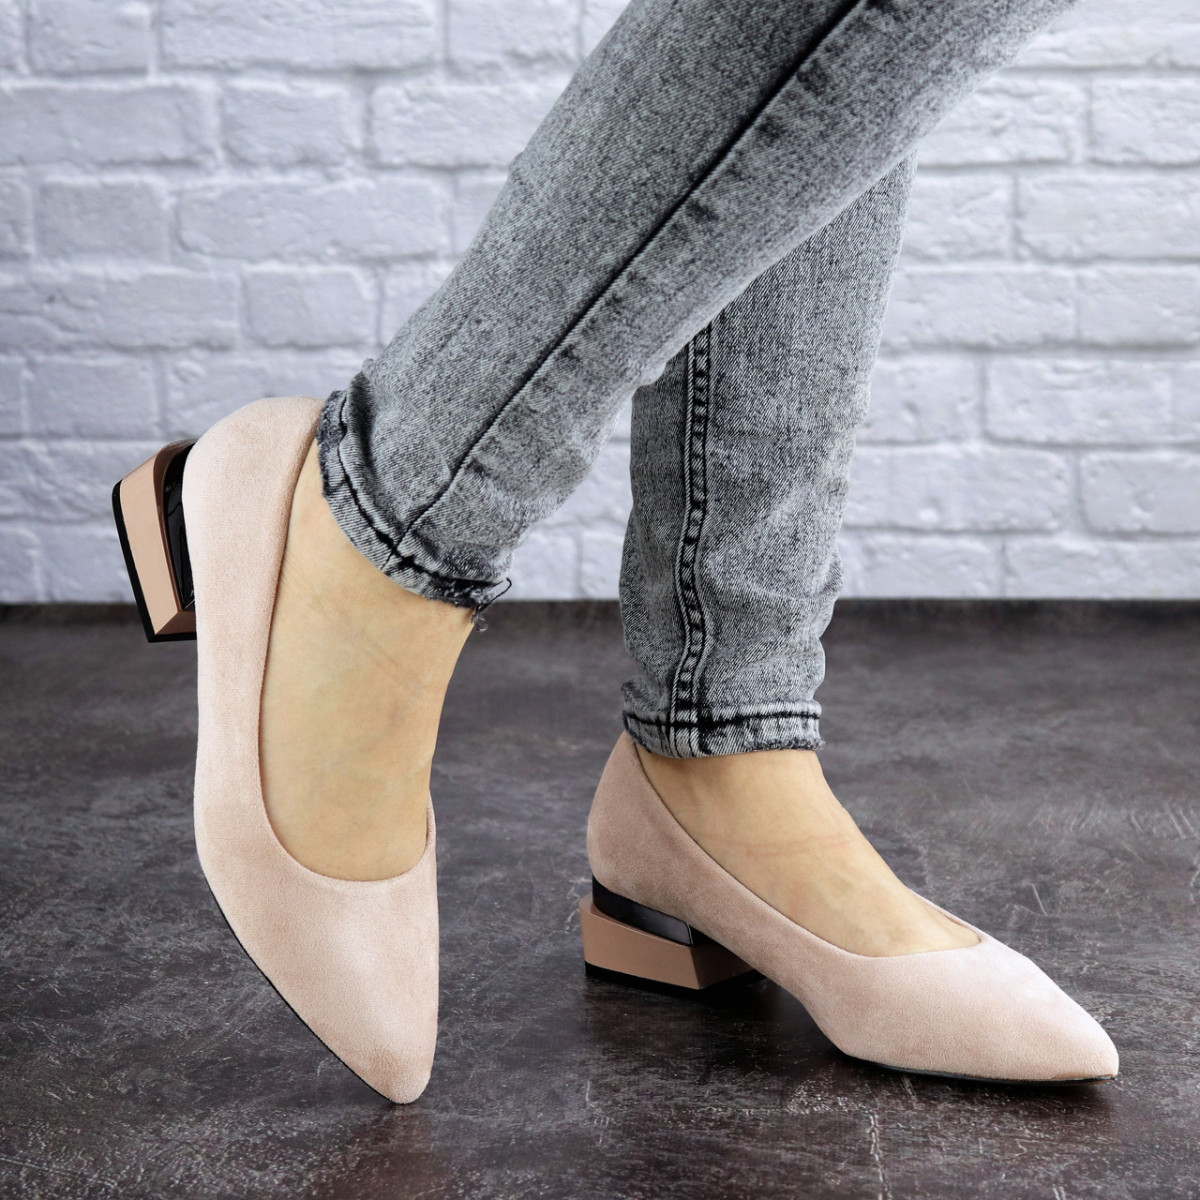 Женские туфли пудровые Tally 2026 (36 размер)